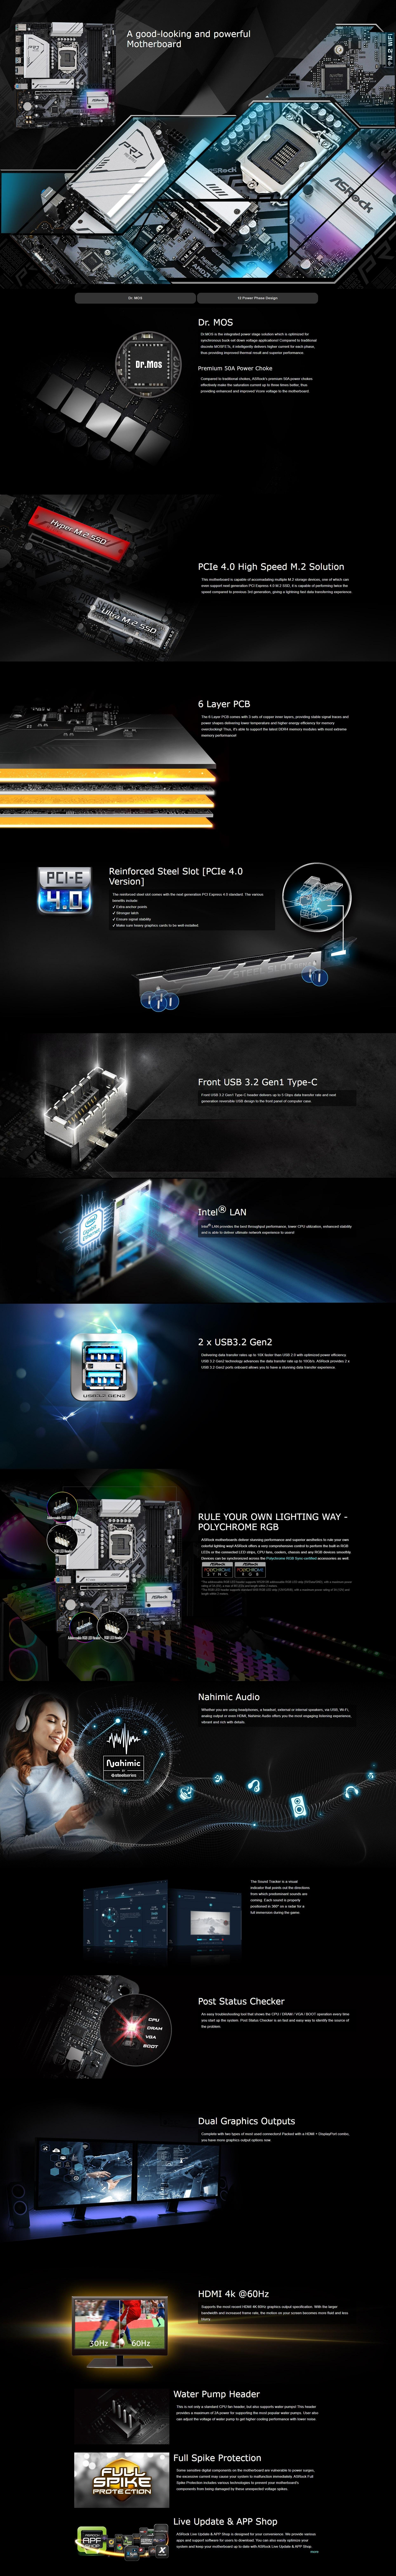 A large marketing image providing additional information about the product ASRock Z590M Pro4 LGA1200 mATX Desktop Motherboard - Additional alt info not provided